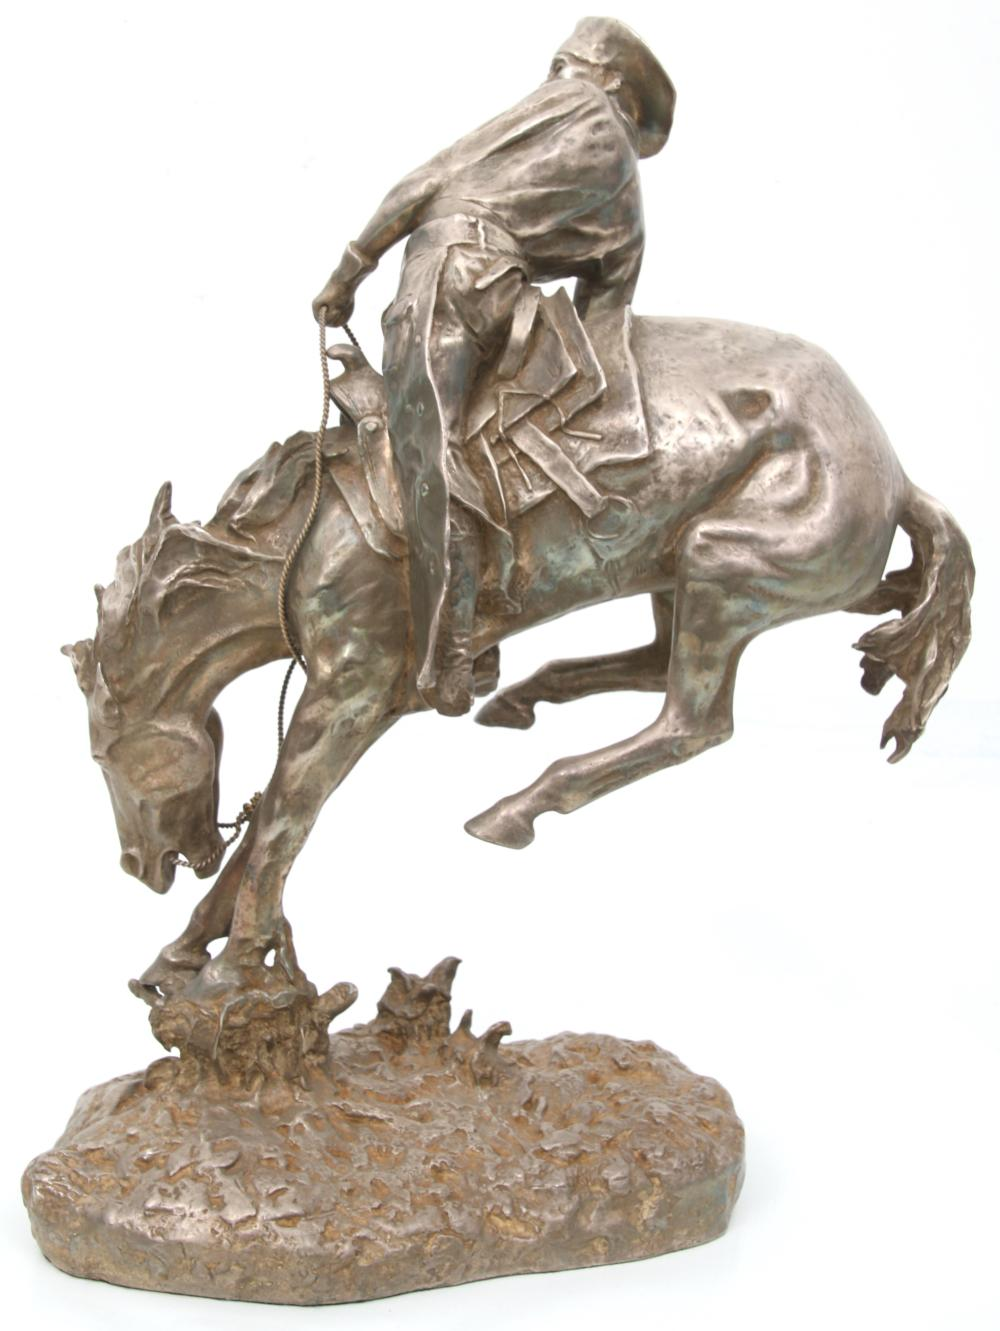 Fine Silver Sculpture After Frederic Remington